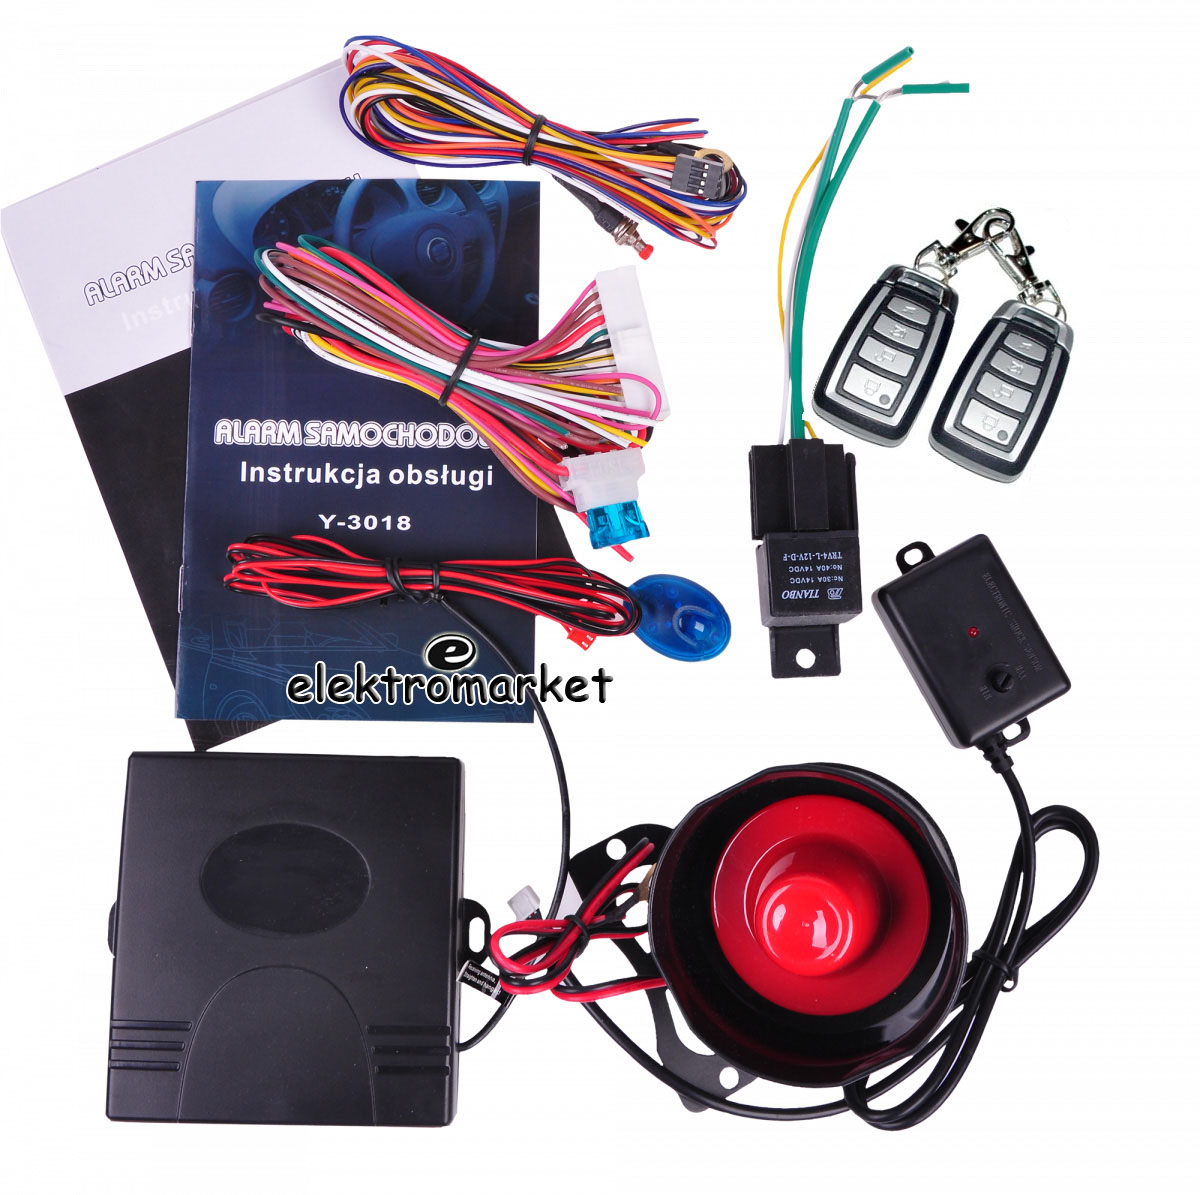 alarm samochodowy peiying PY-3018